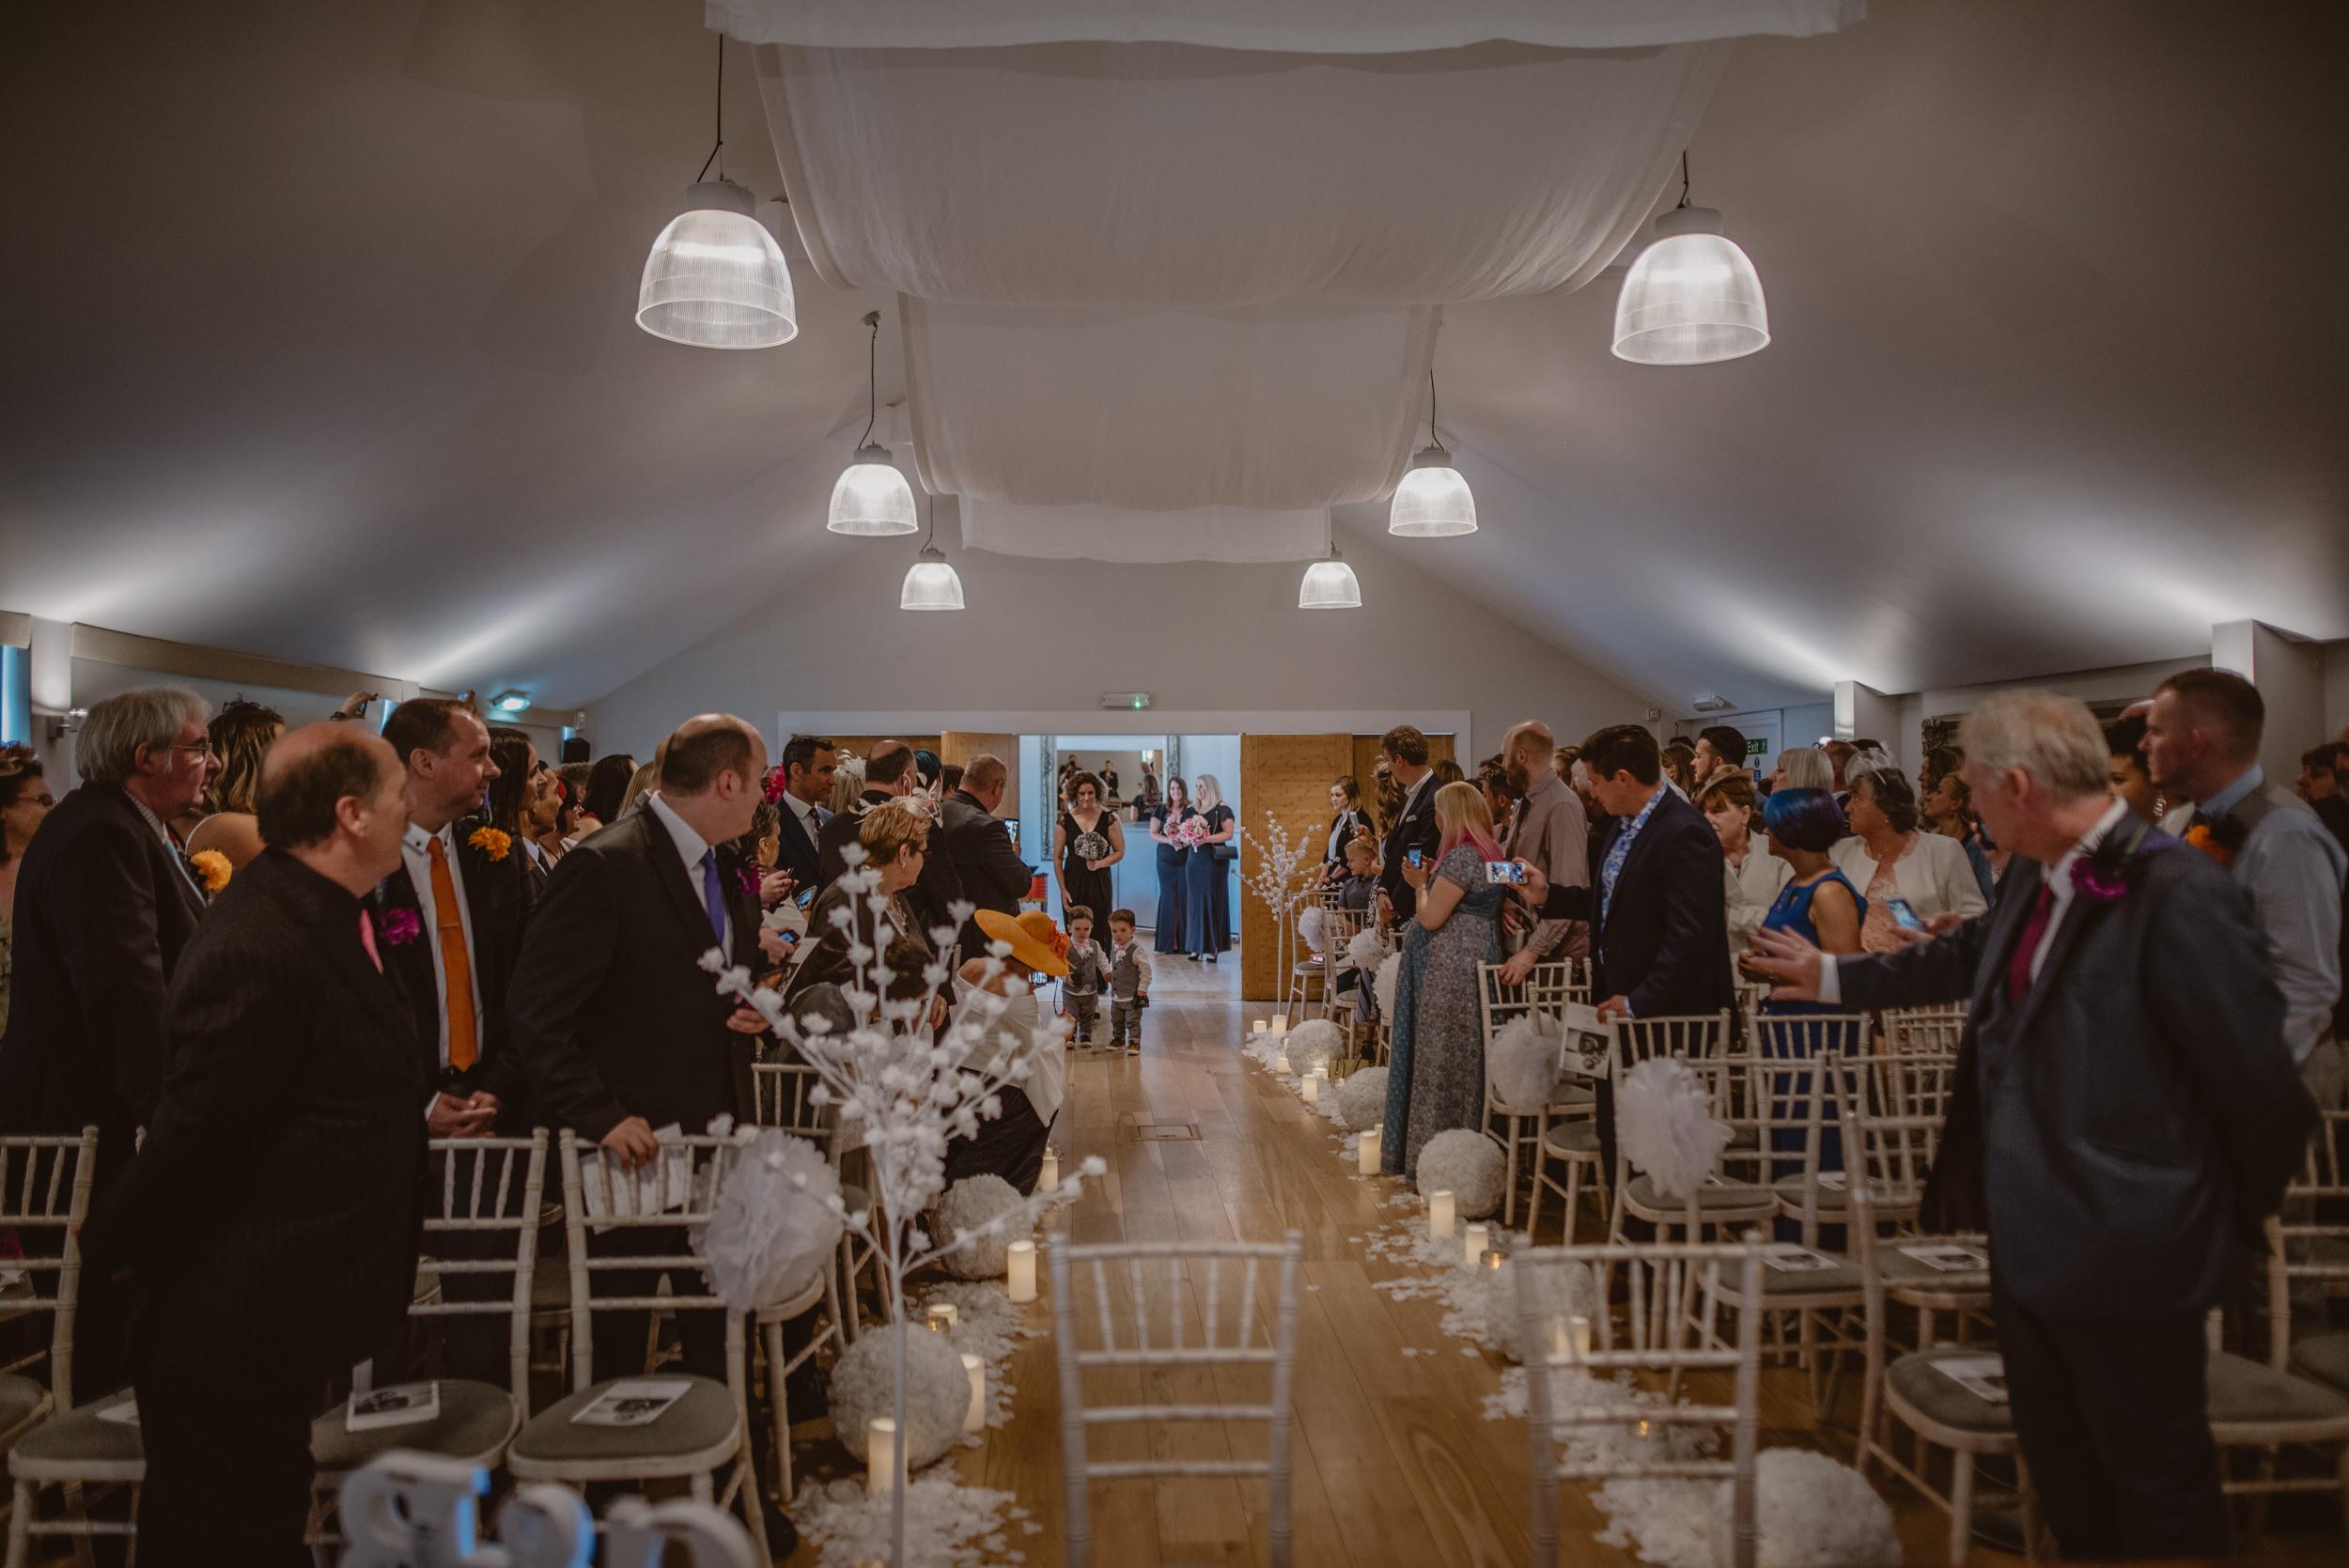 Barry-and-Chaz-wedding-Wasing-Park-Berkshire-Manu-Mendoza-Wedding-Photography-164.jpg